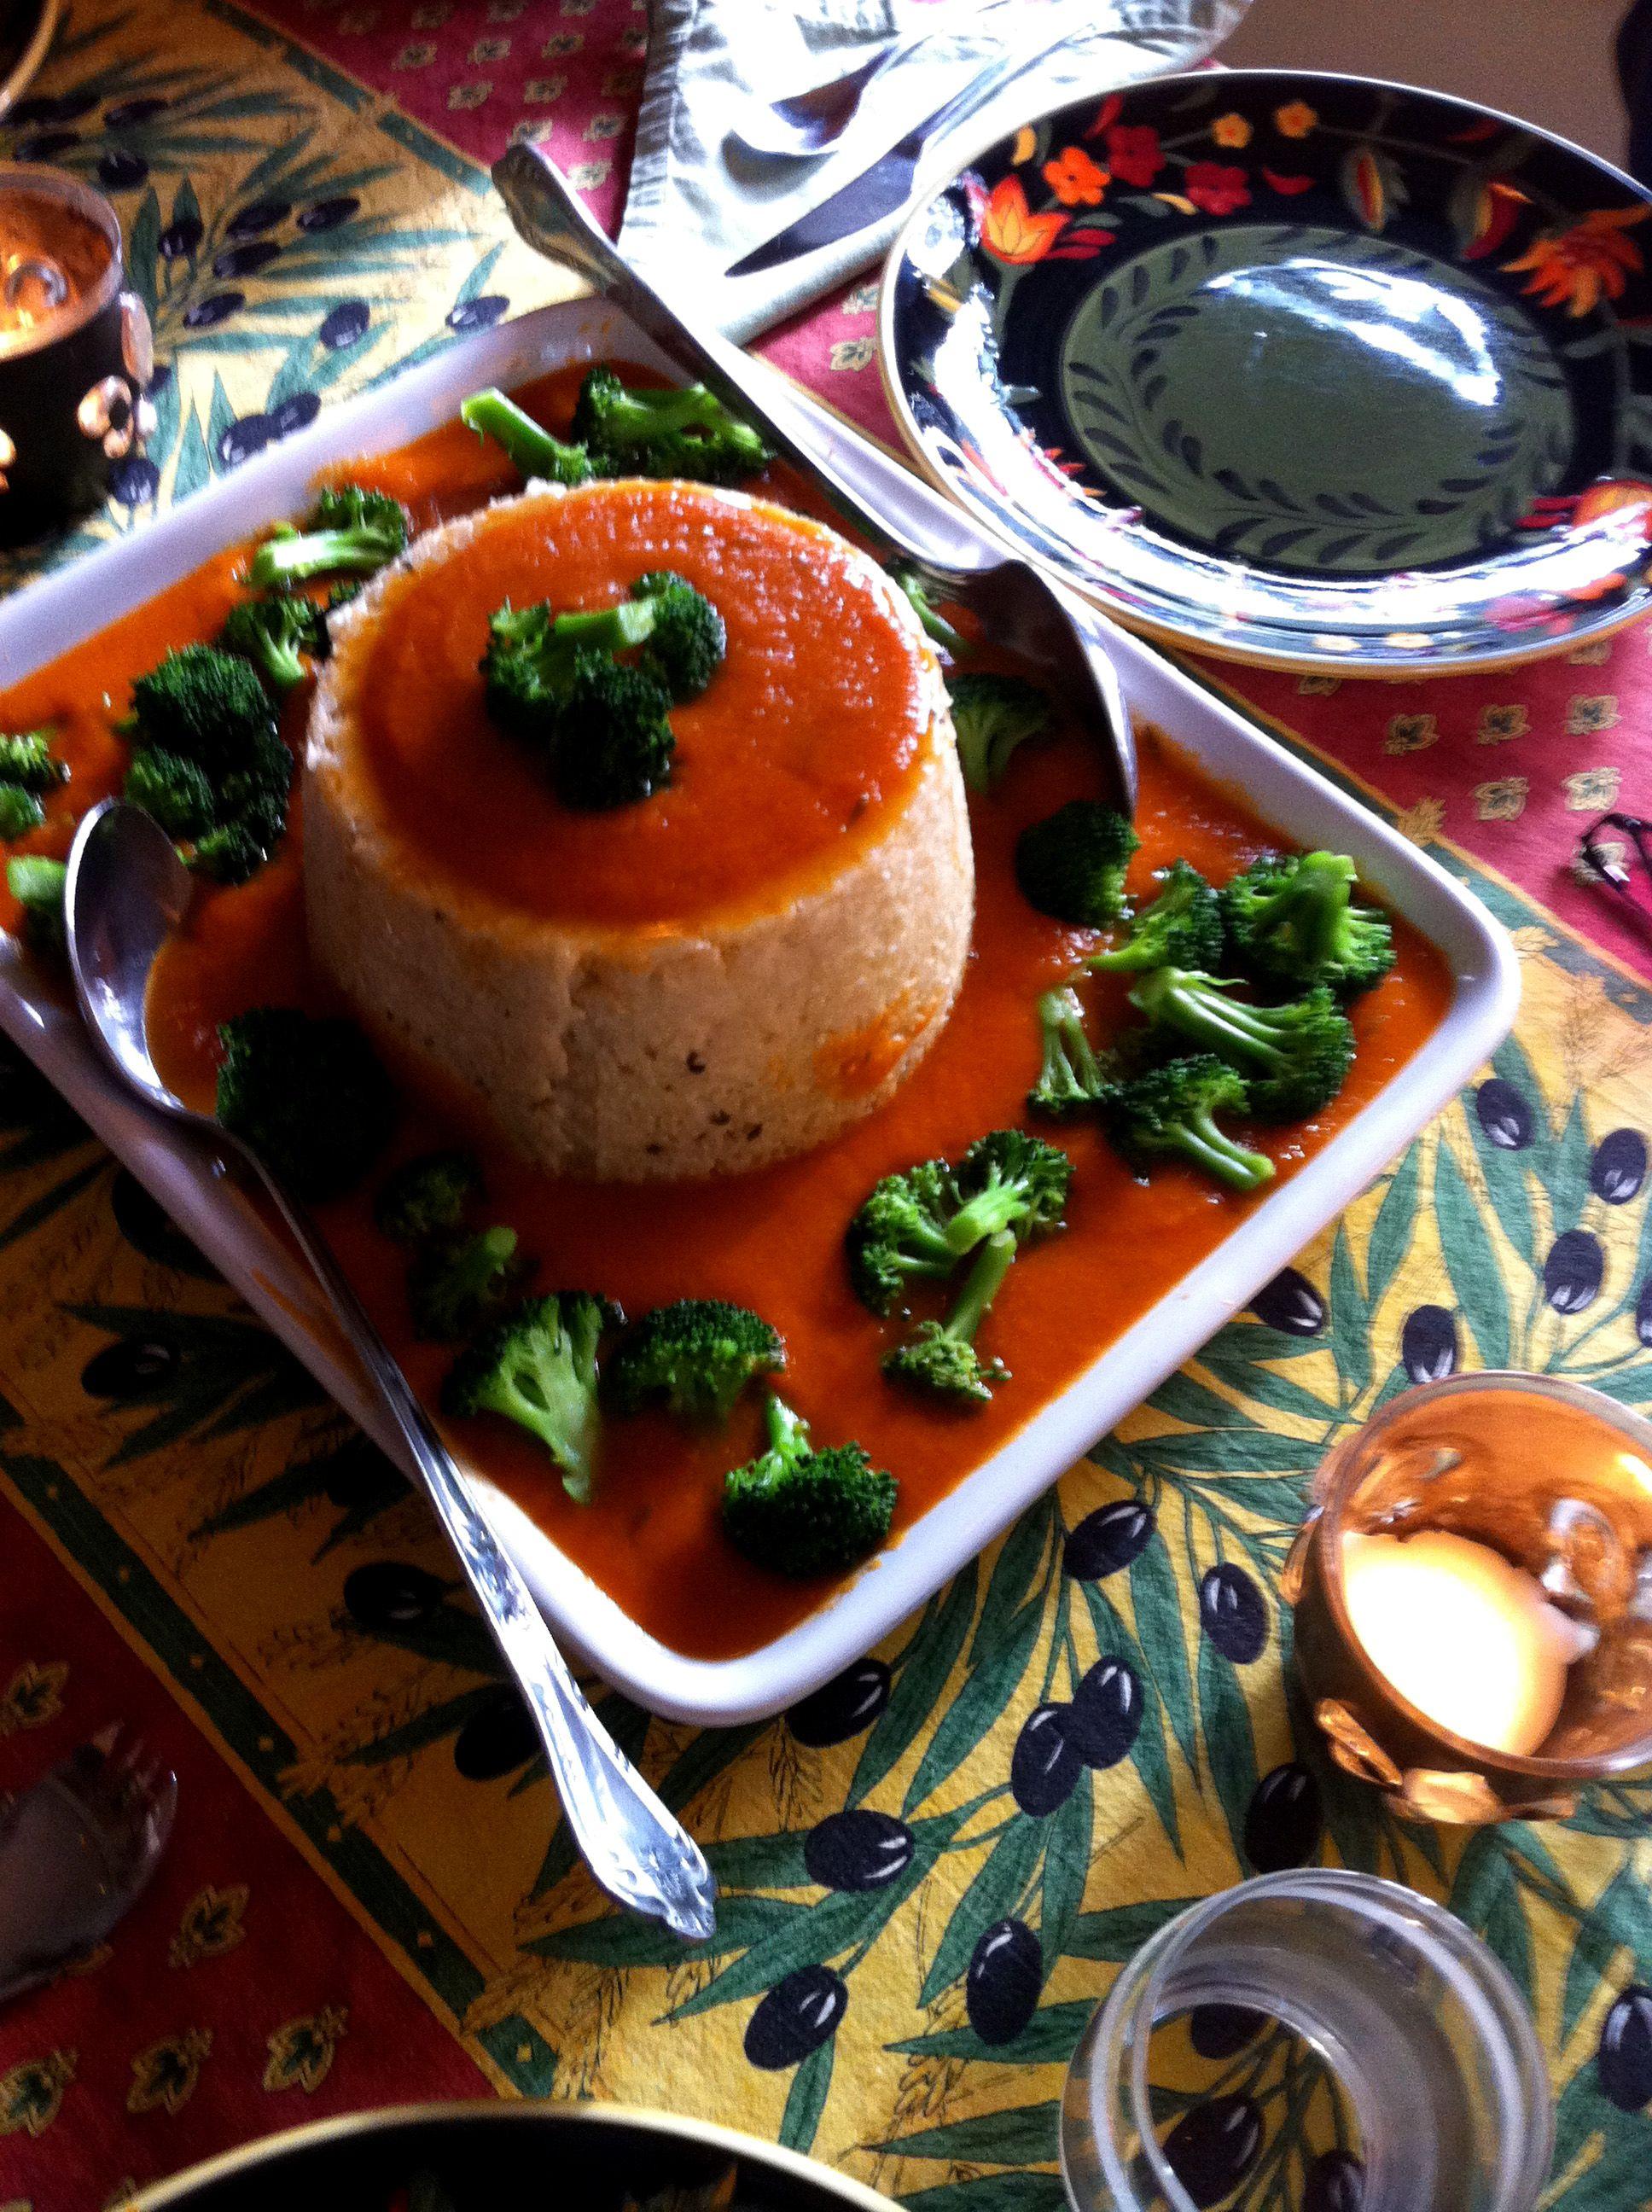 Park Art My WordPress Blog_Rich Piana Real Food Uk